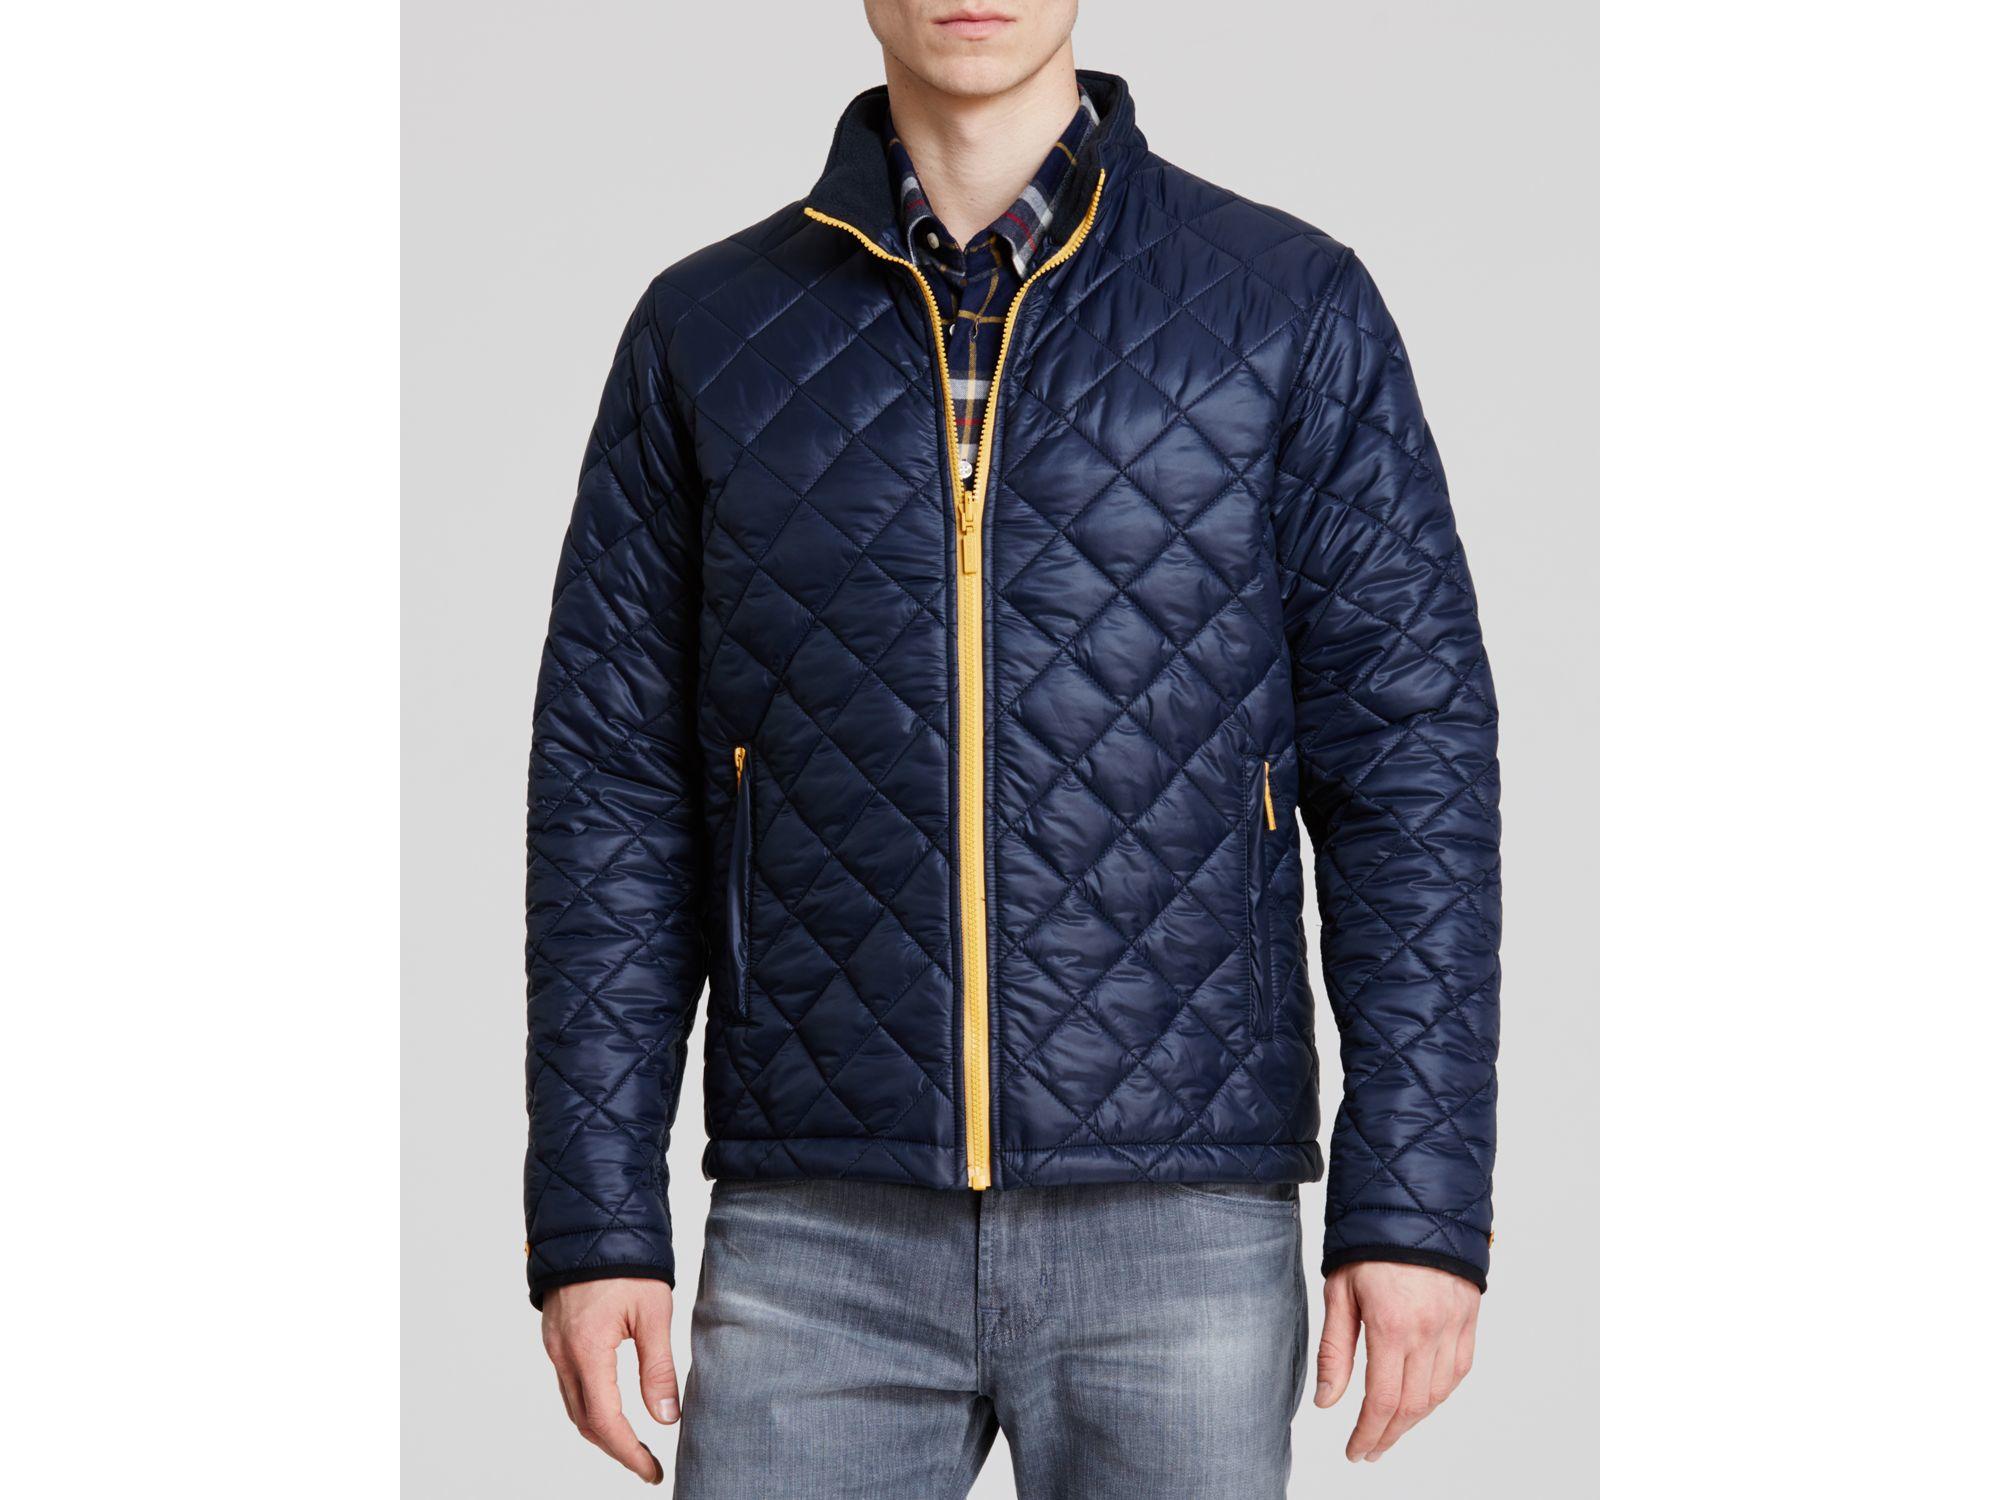 Barbour Navy Blue Jacket